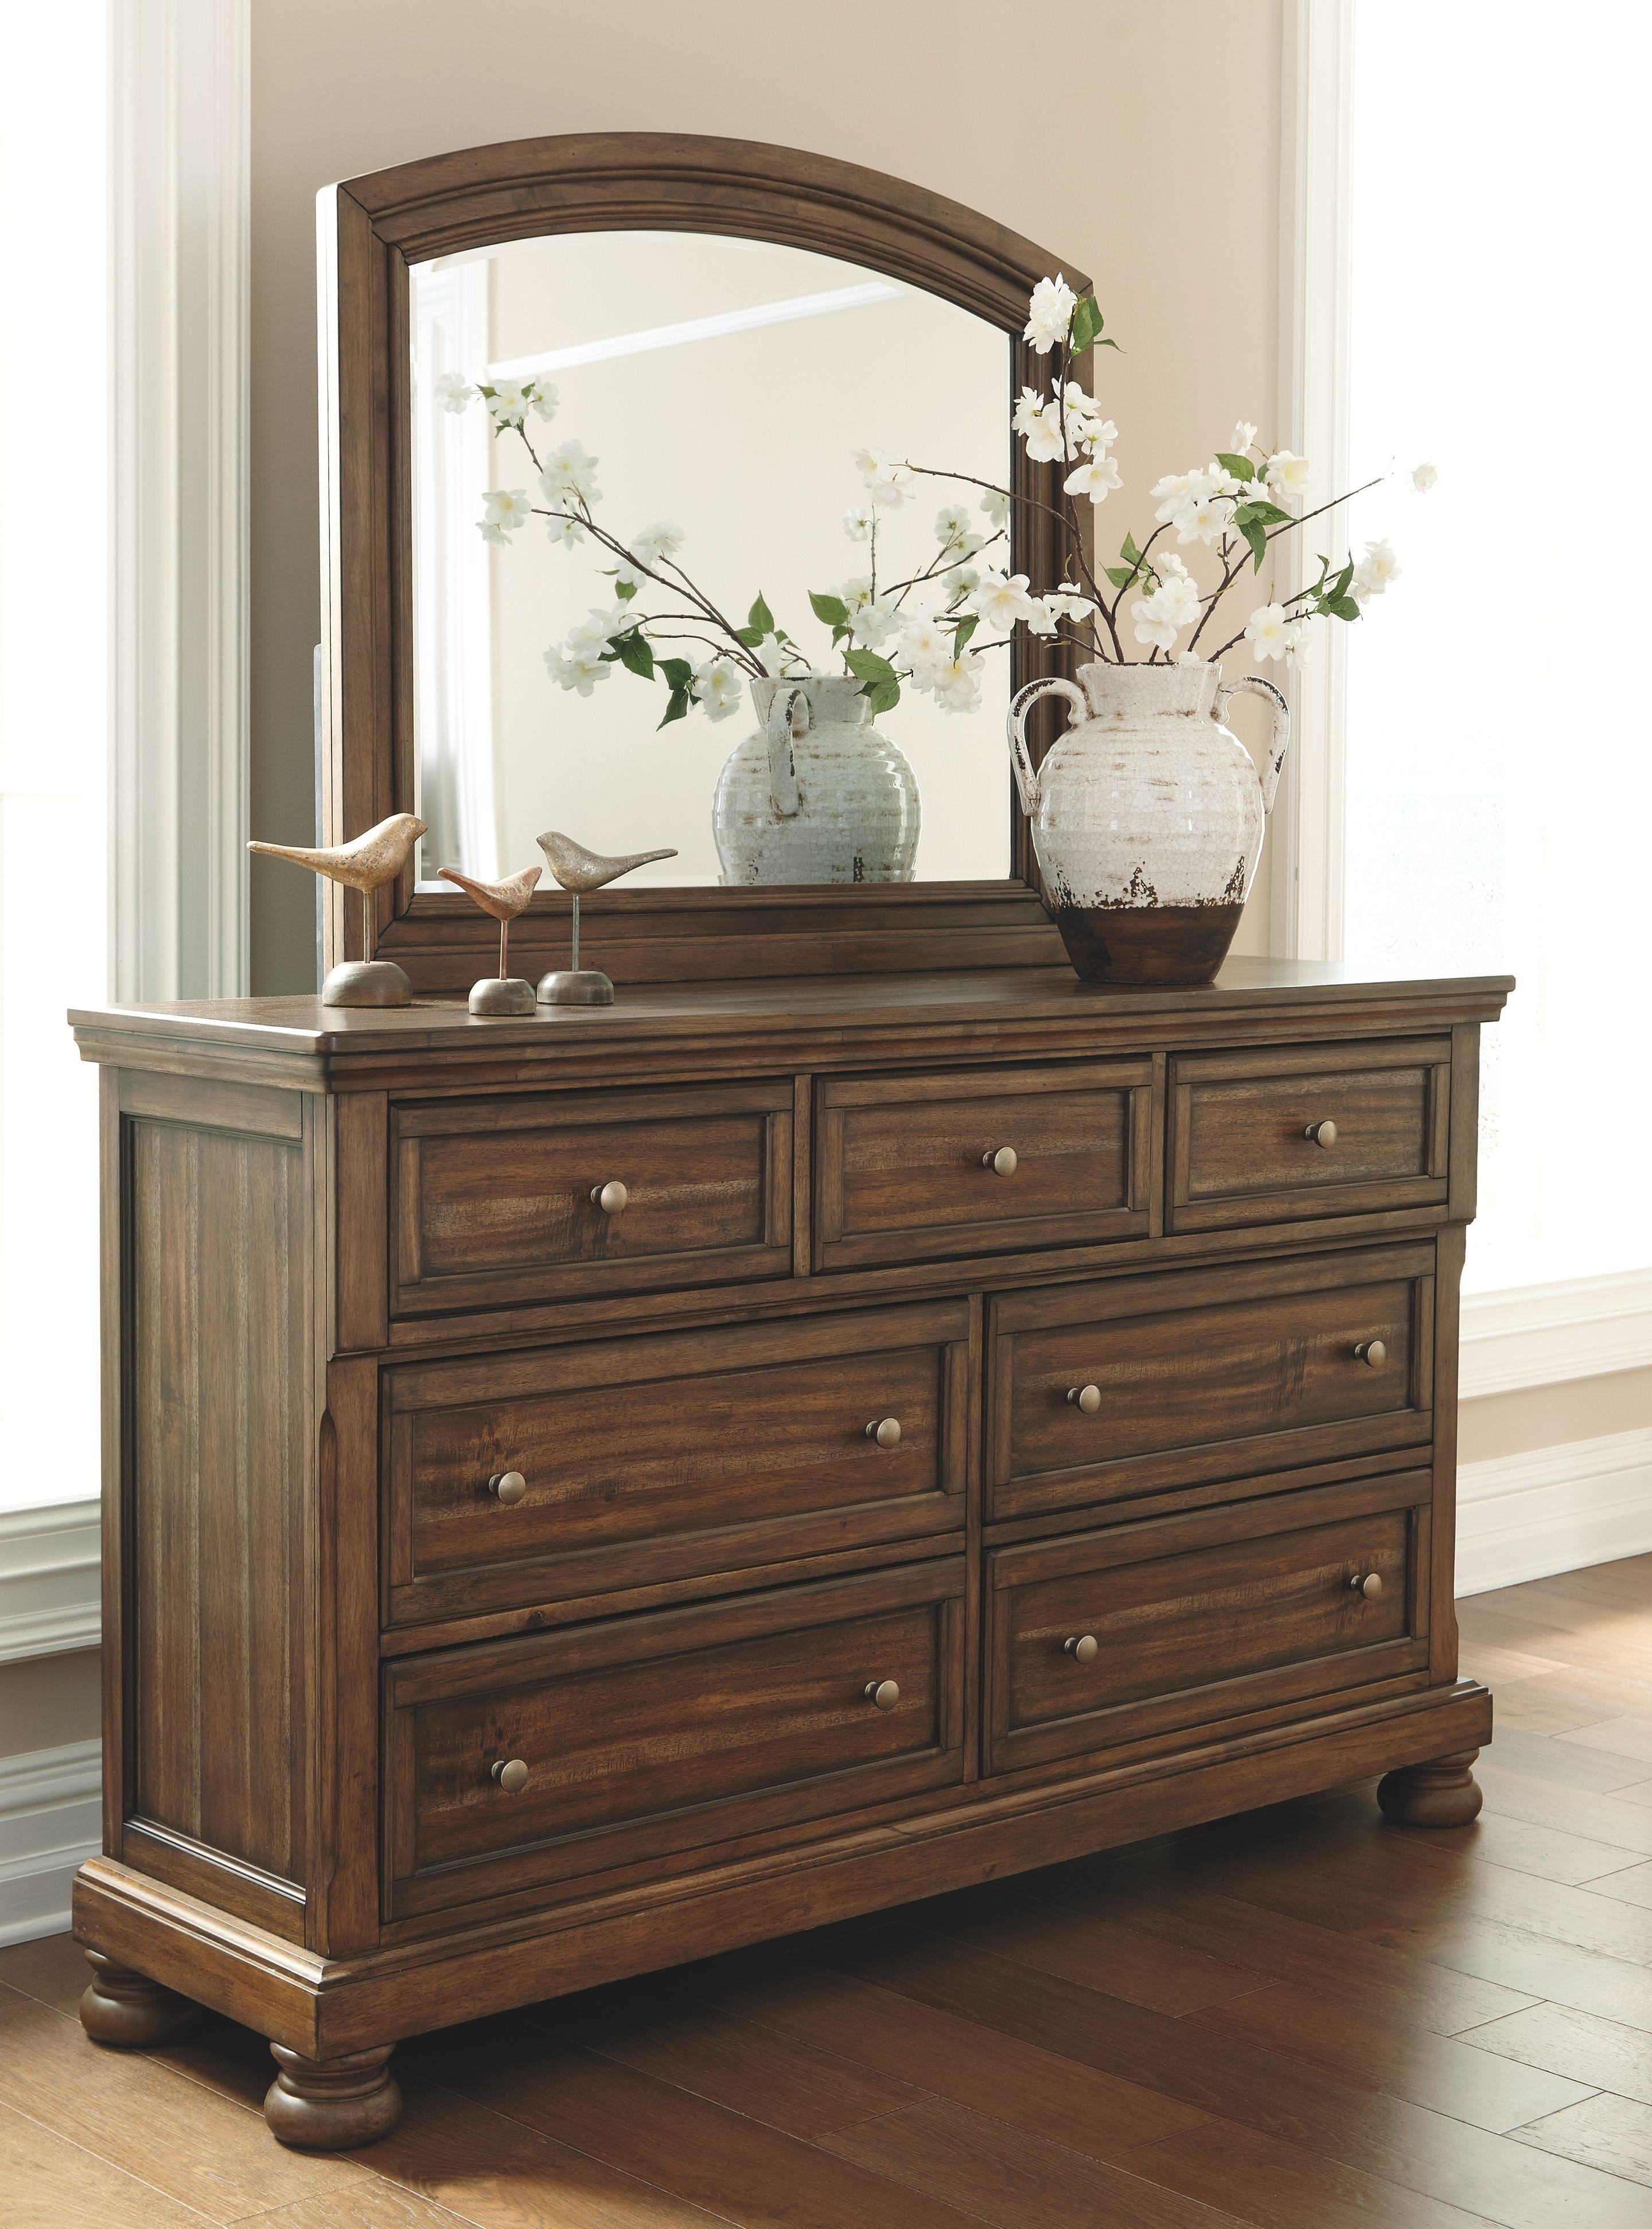 Accessories Mirrors Wrights Furniture & Flooring Dieterich IL